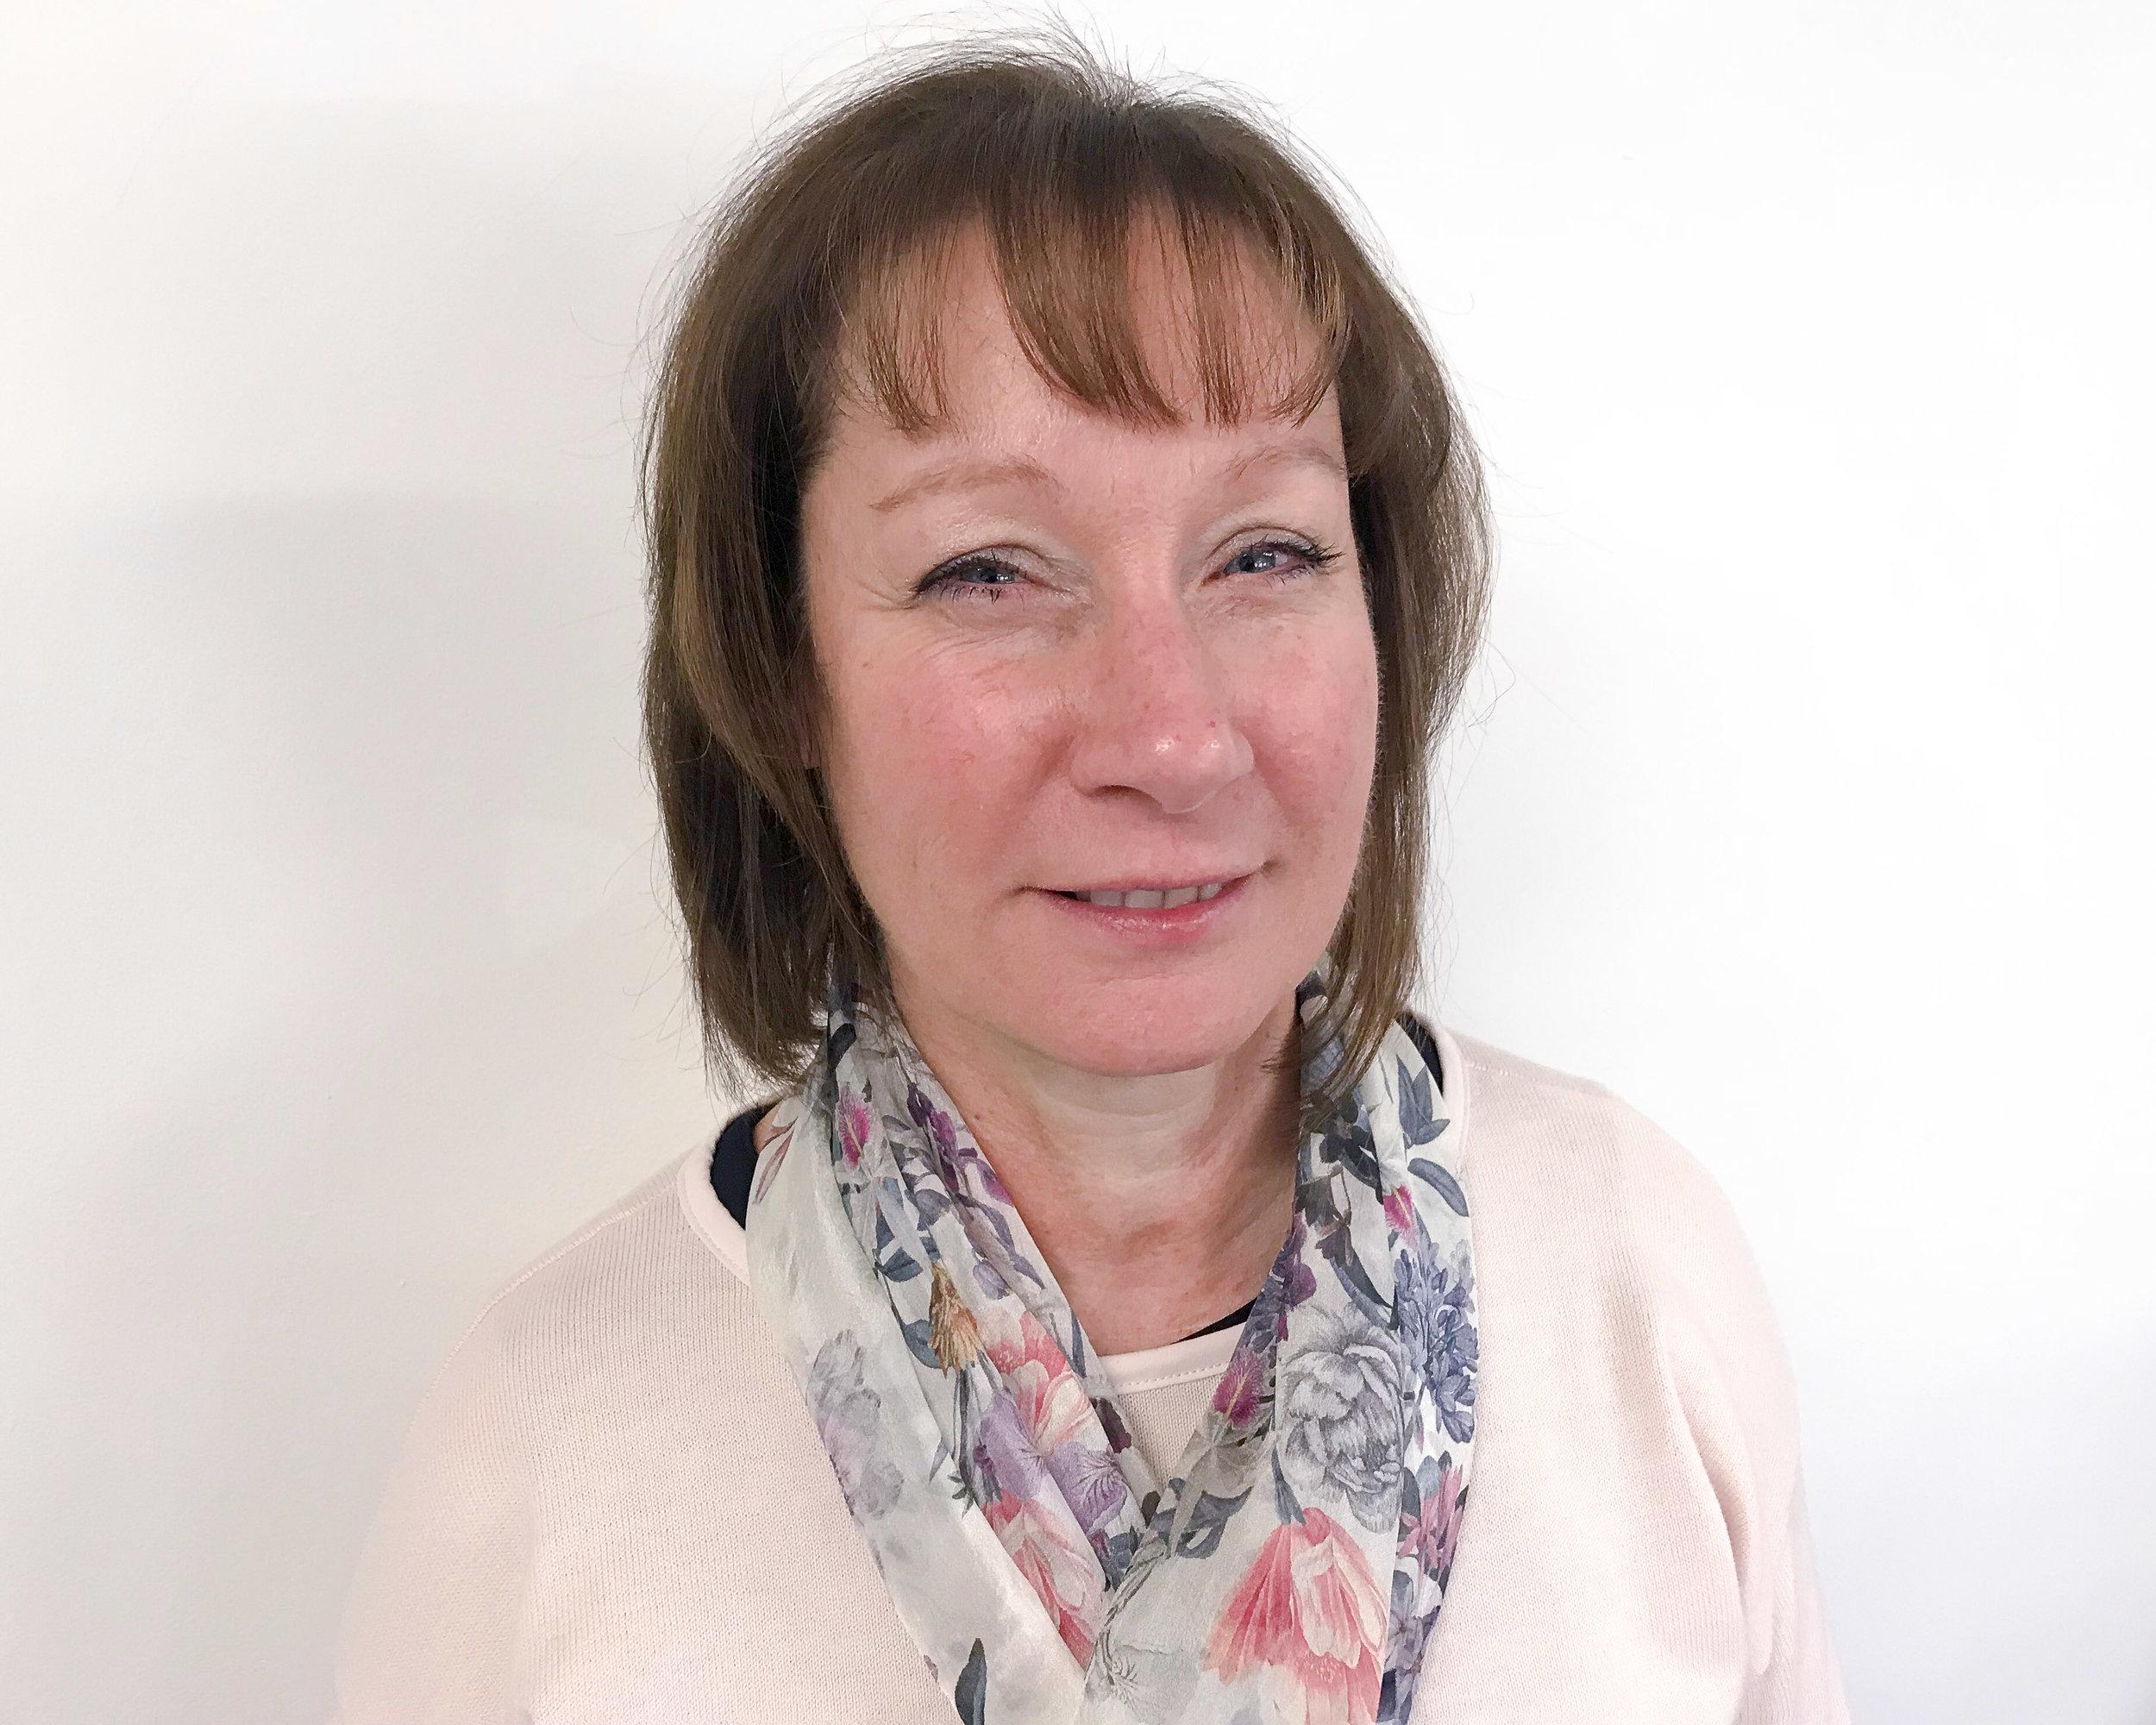 Susan Crafter - Company secretarysusan@rlcrafter.com